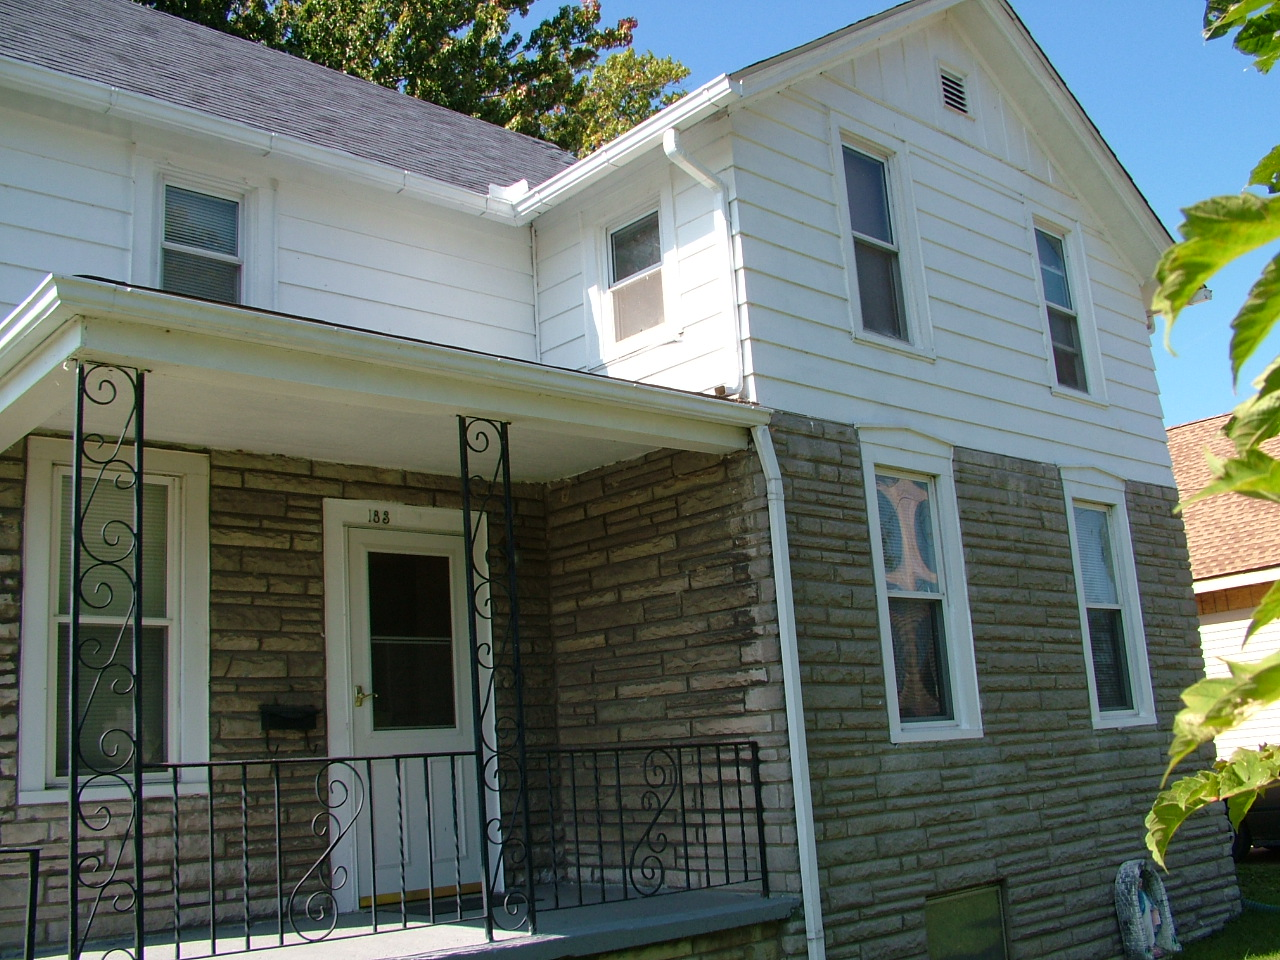 183 Georgia Ave, Lorain, OH  44052